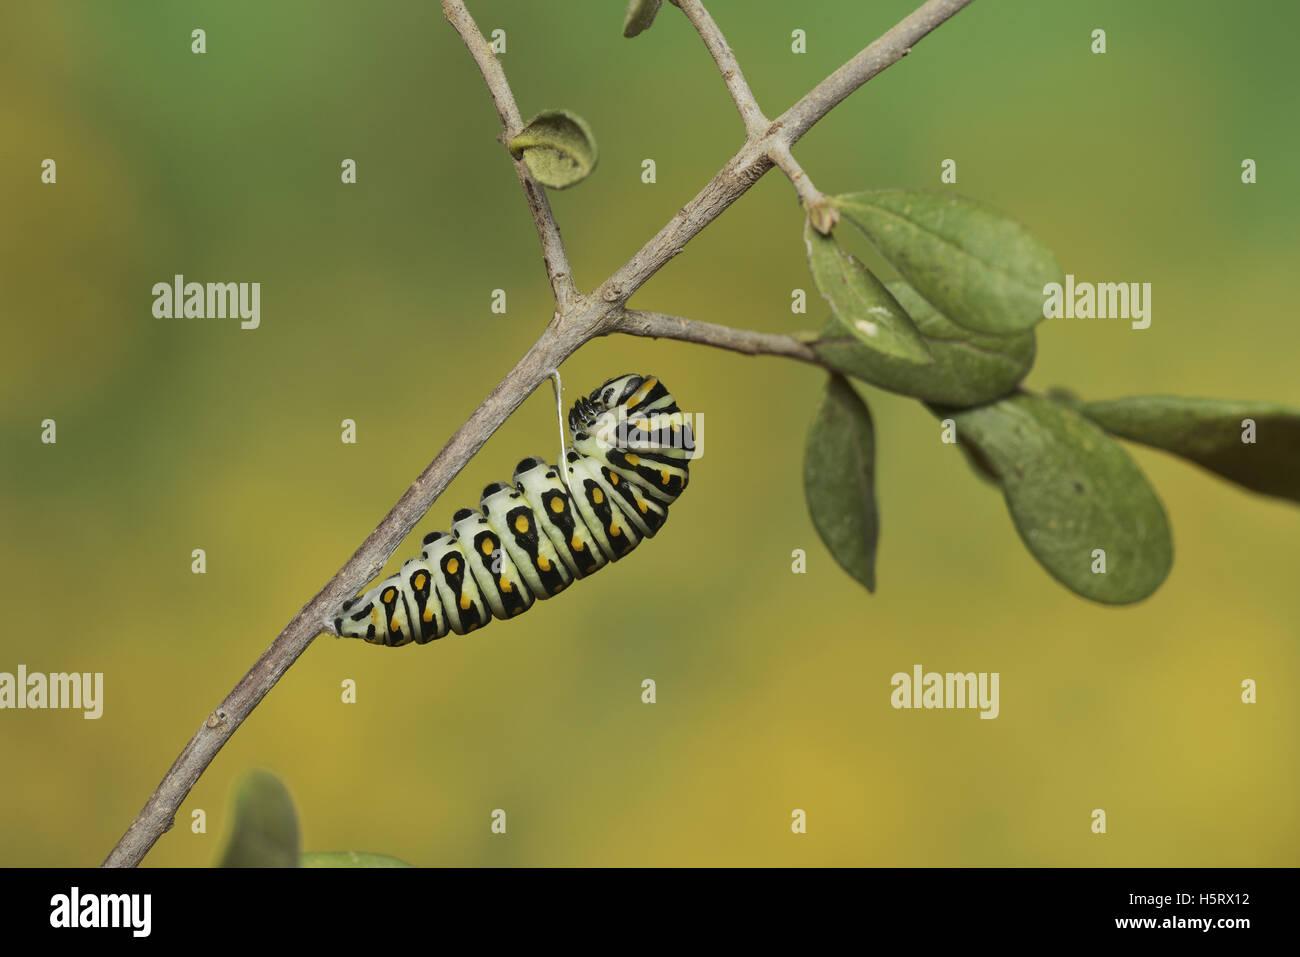 Papilio polyxenes (especie), Caterpillar pupating en chrysalis, Hill Country, Texas, EE.UU. Foto de stock